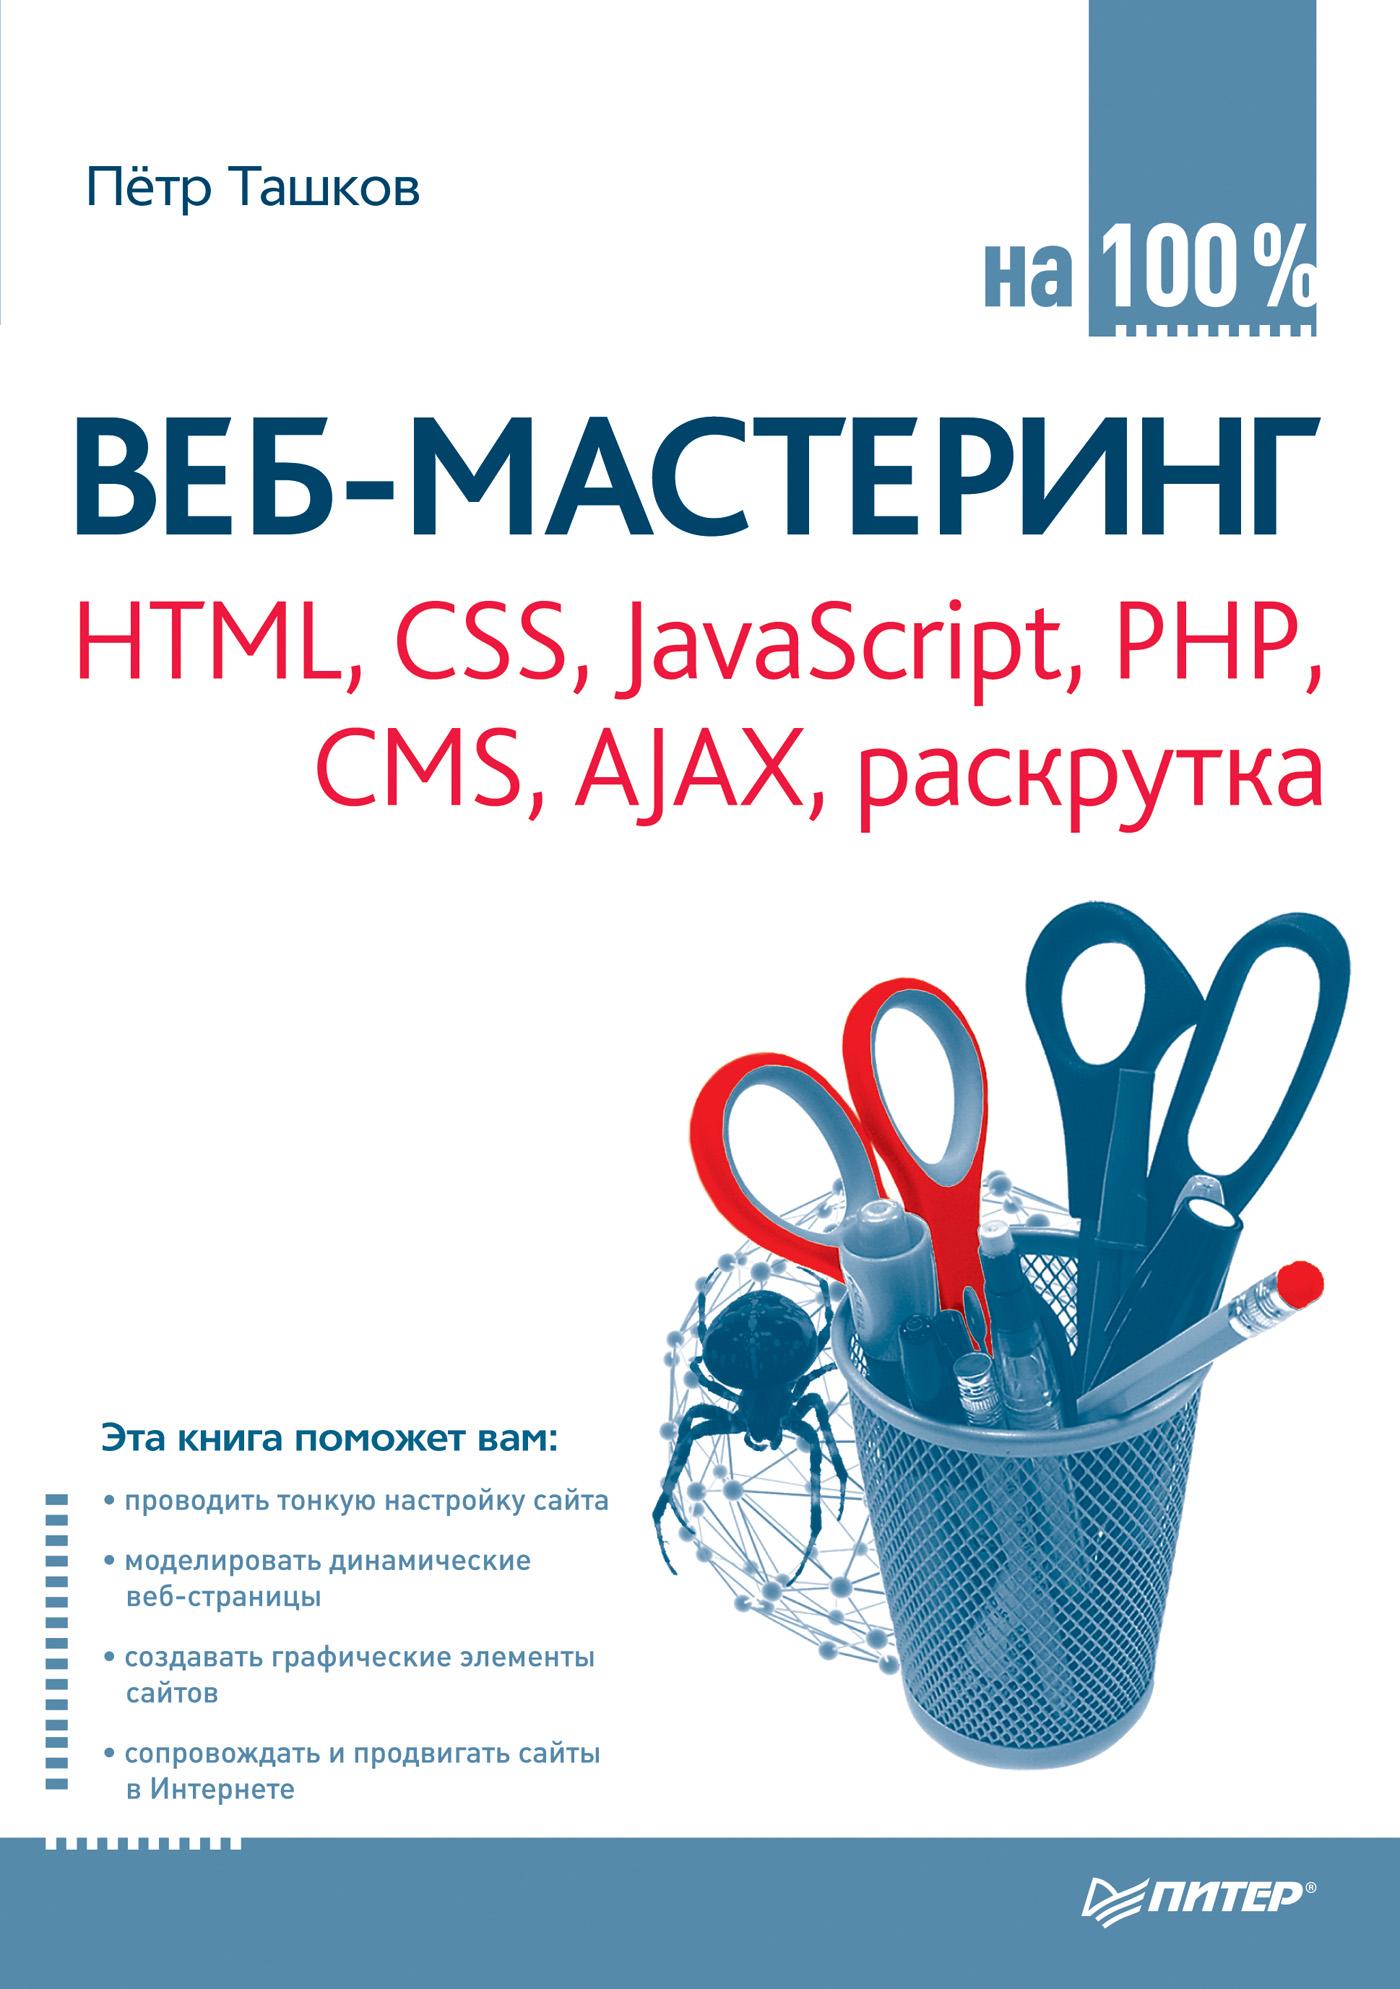 Петр Ташков «Веб-мастеринг: HTML, CSS, JavaScript, PHP, CMS, AJAX, раскрутка»